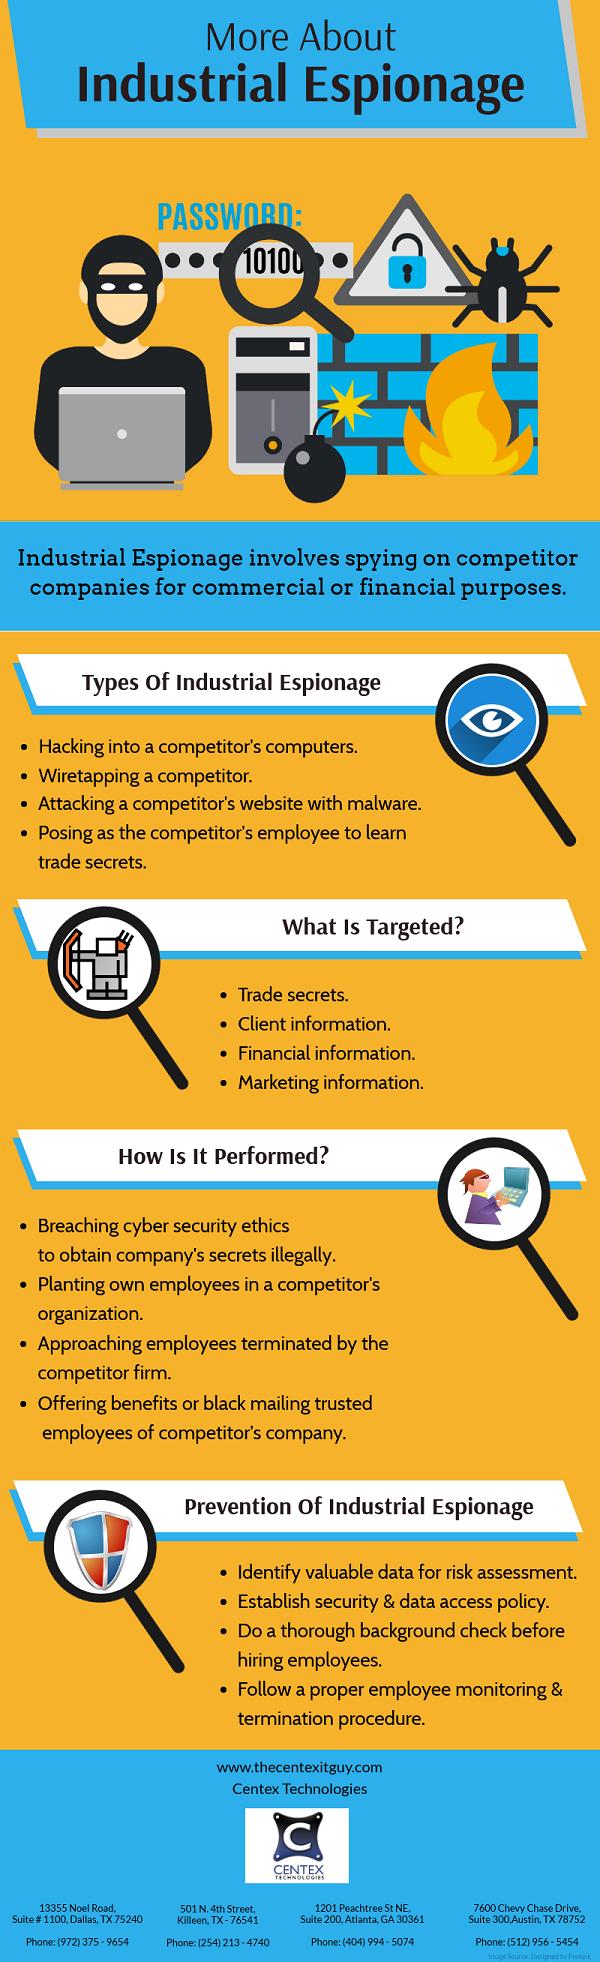 More About Industrial Espionage « Web Development Austin